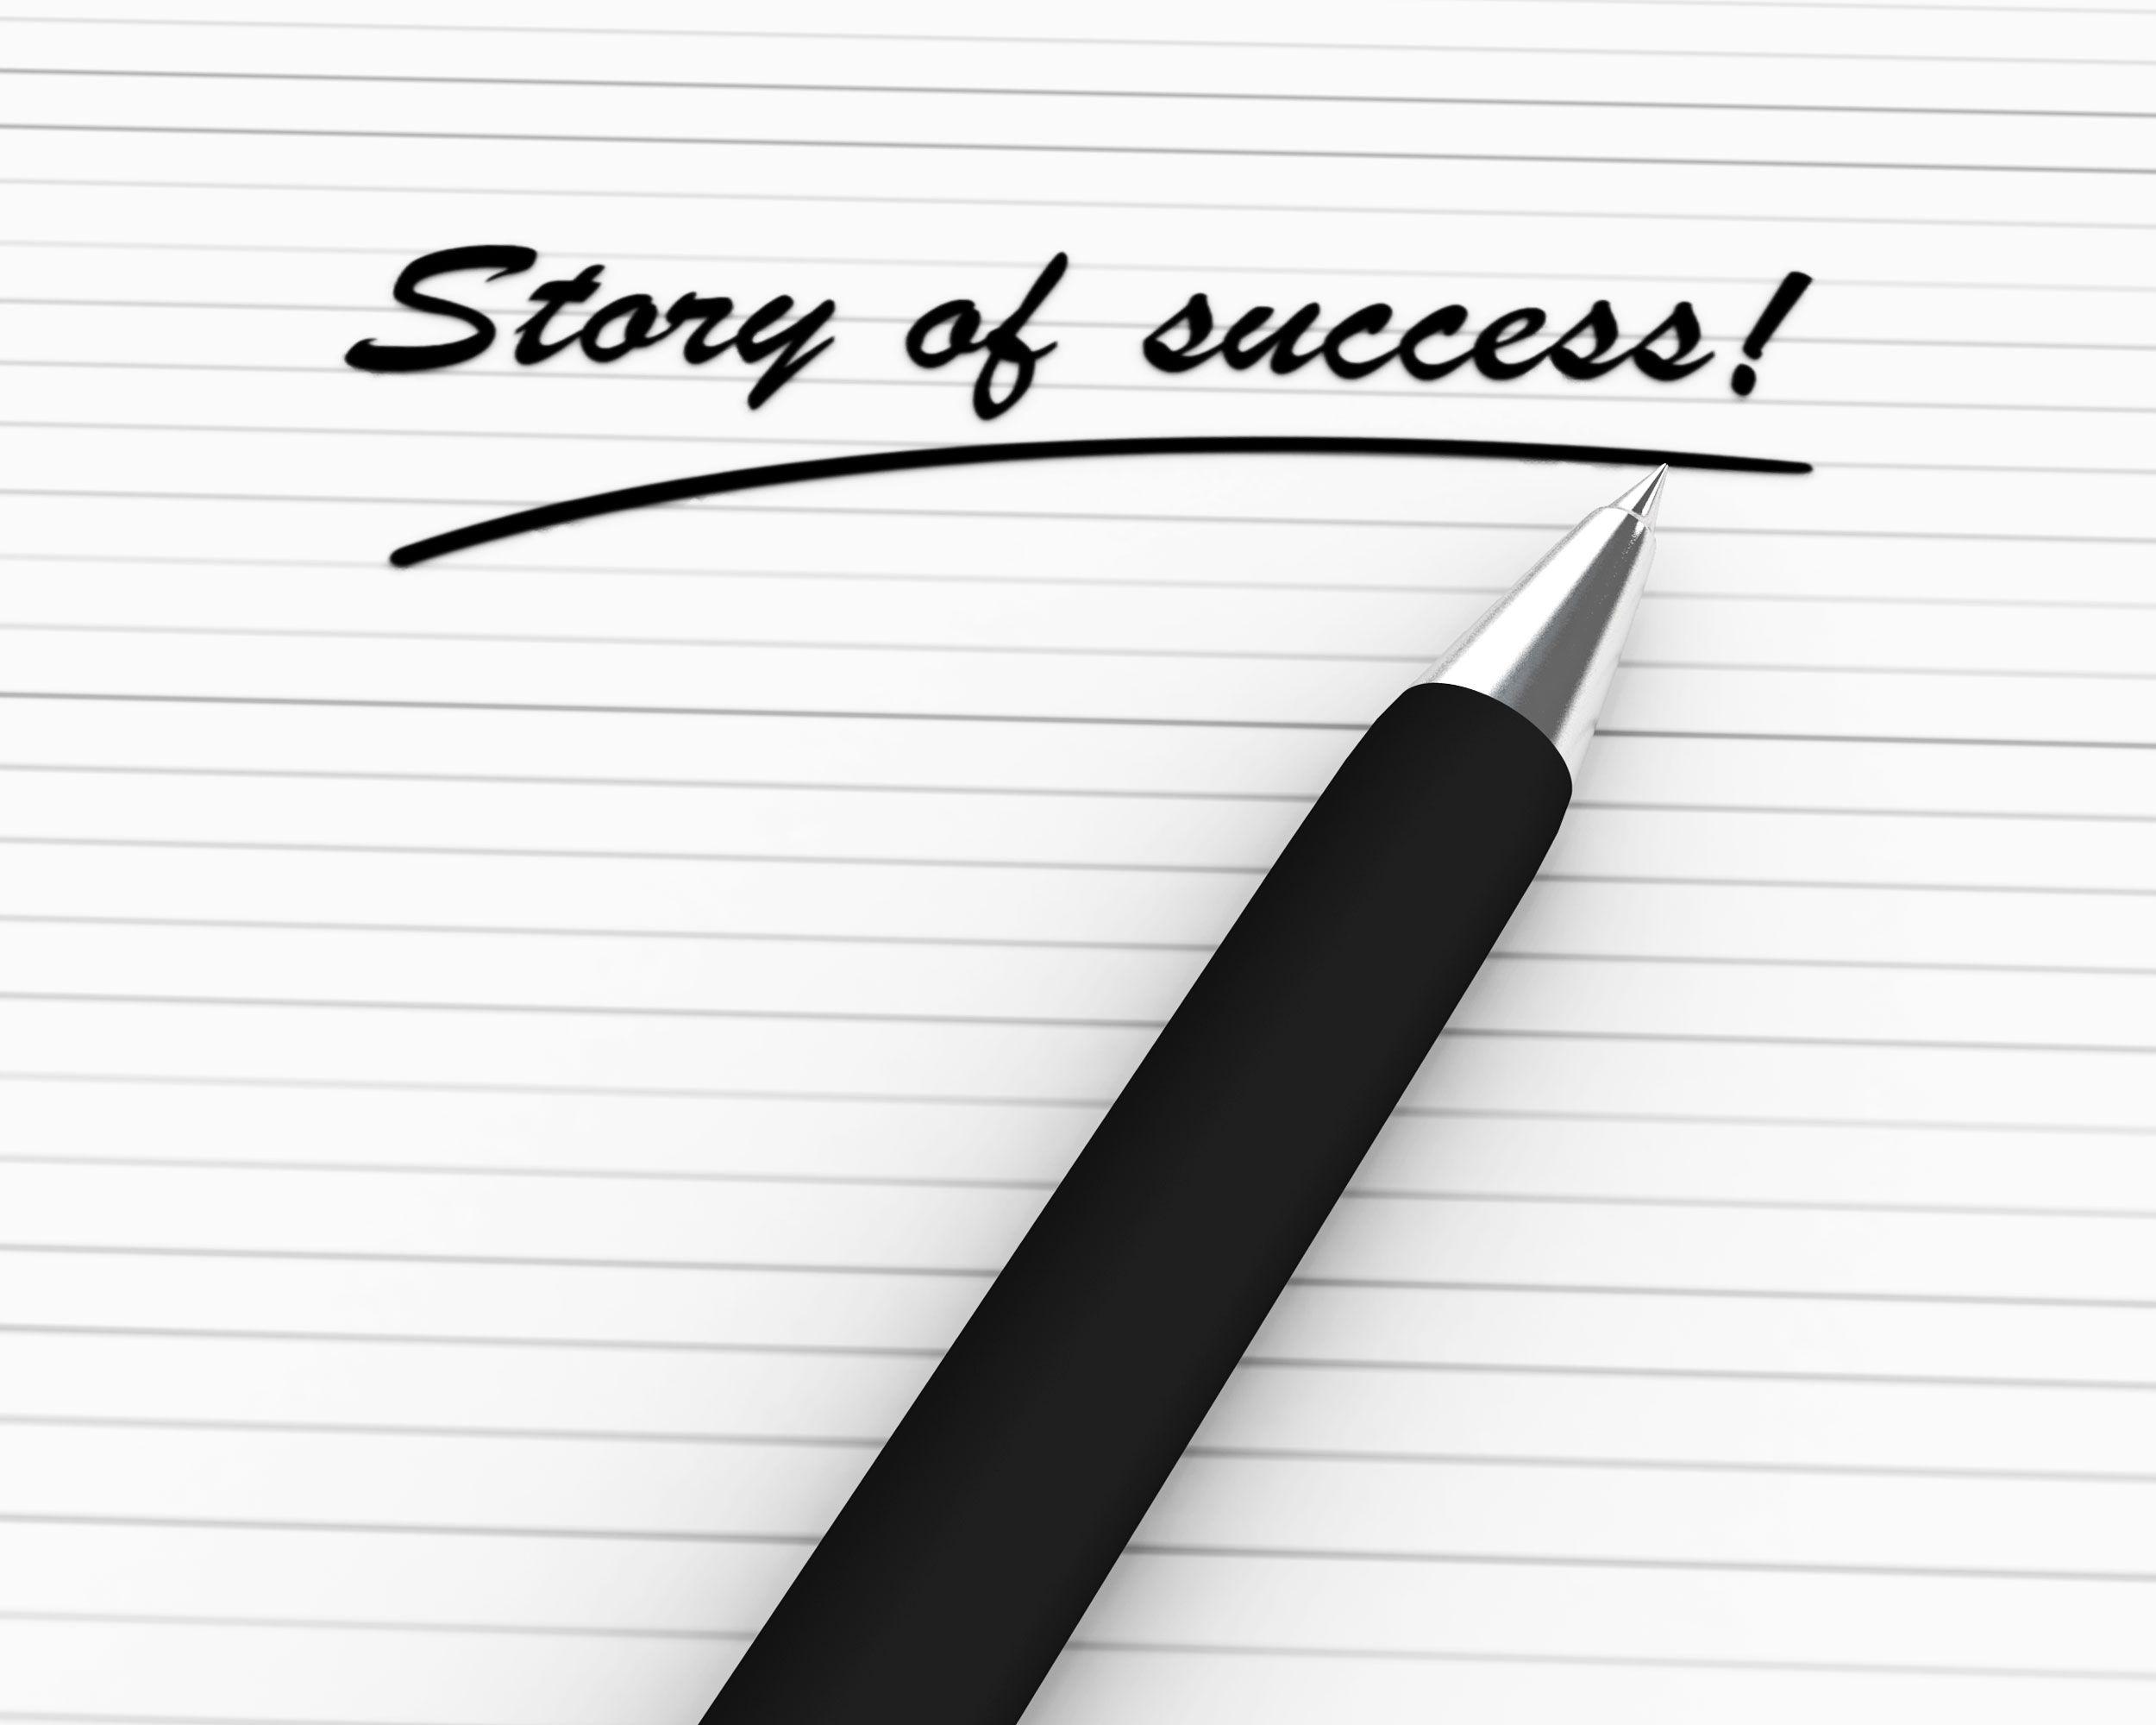 pen_writing_story_of_success_stock_photo_Slide01